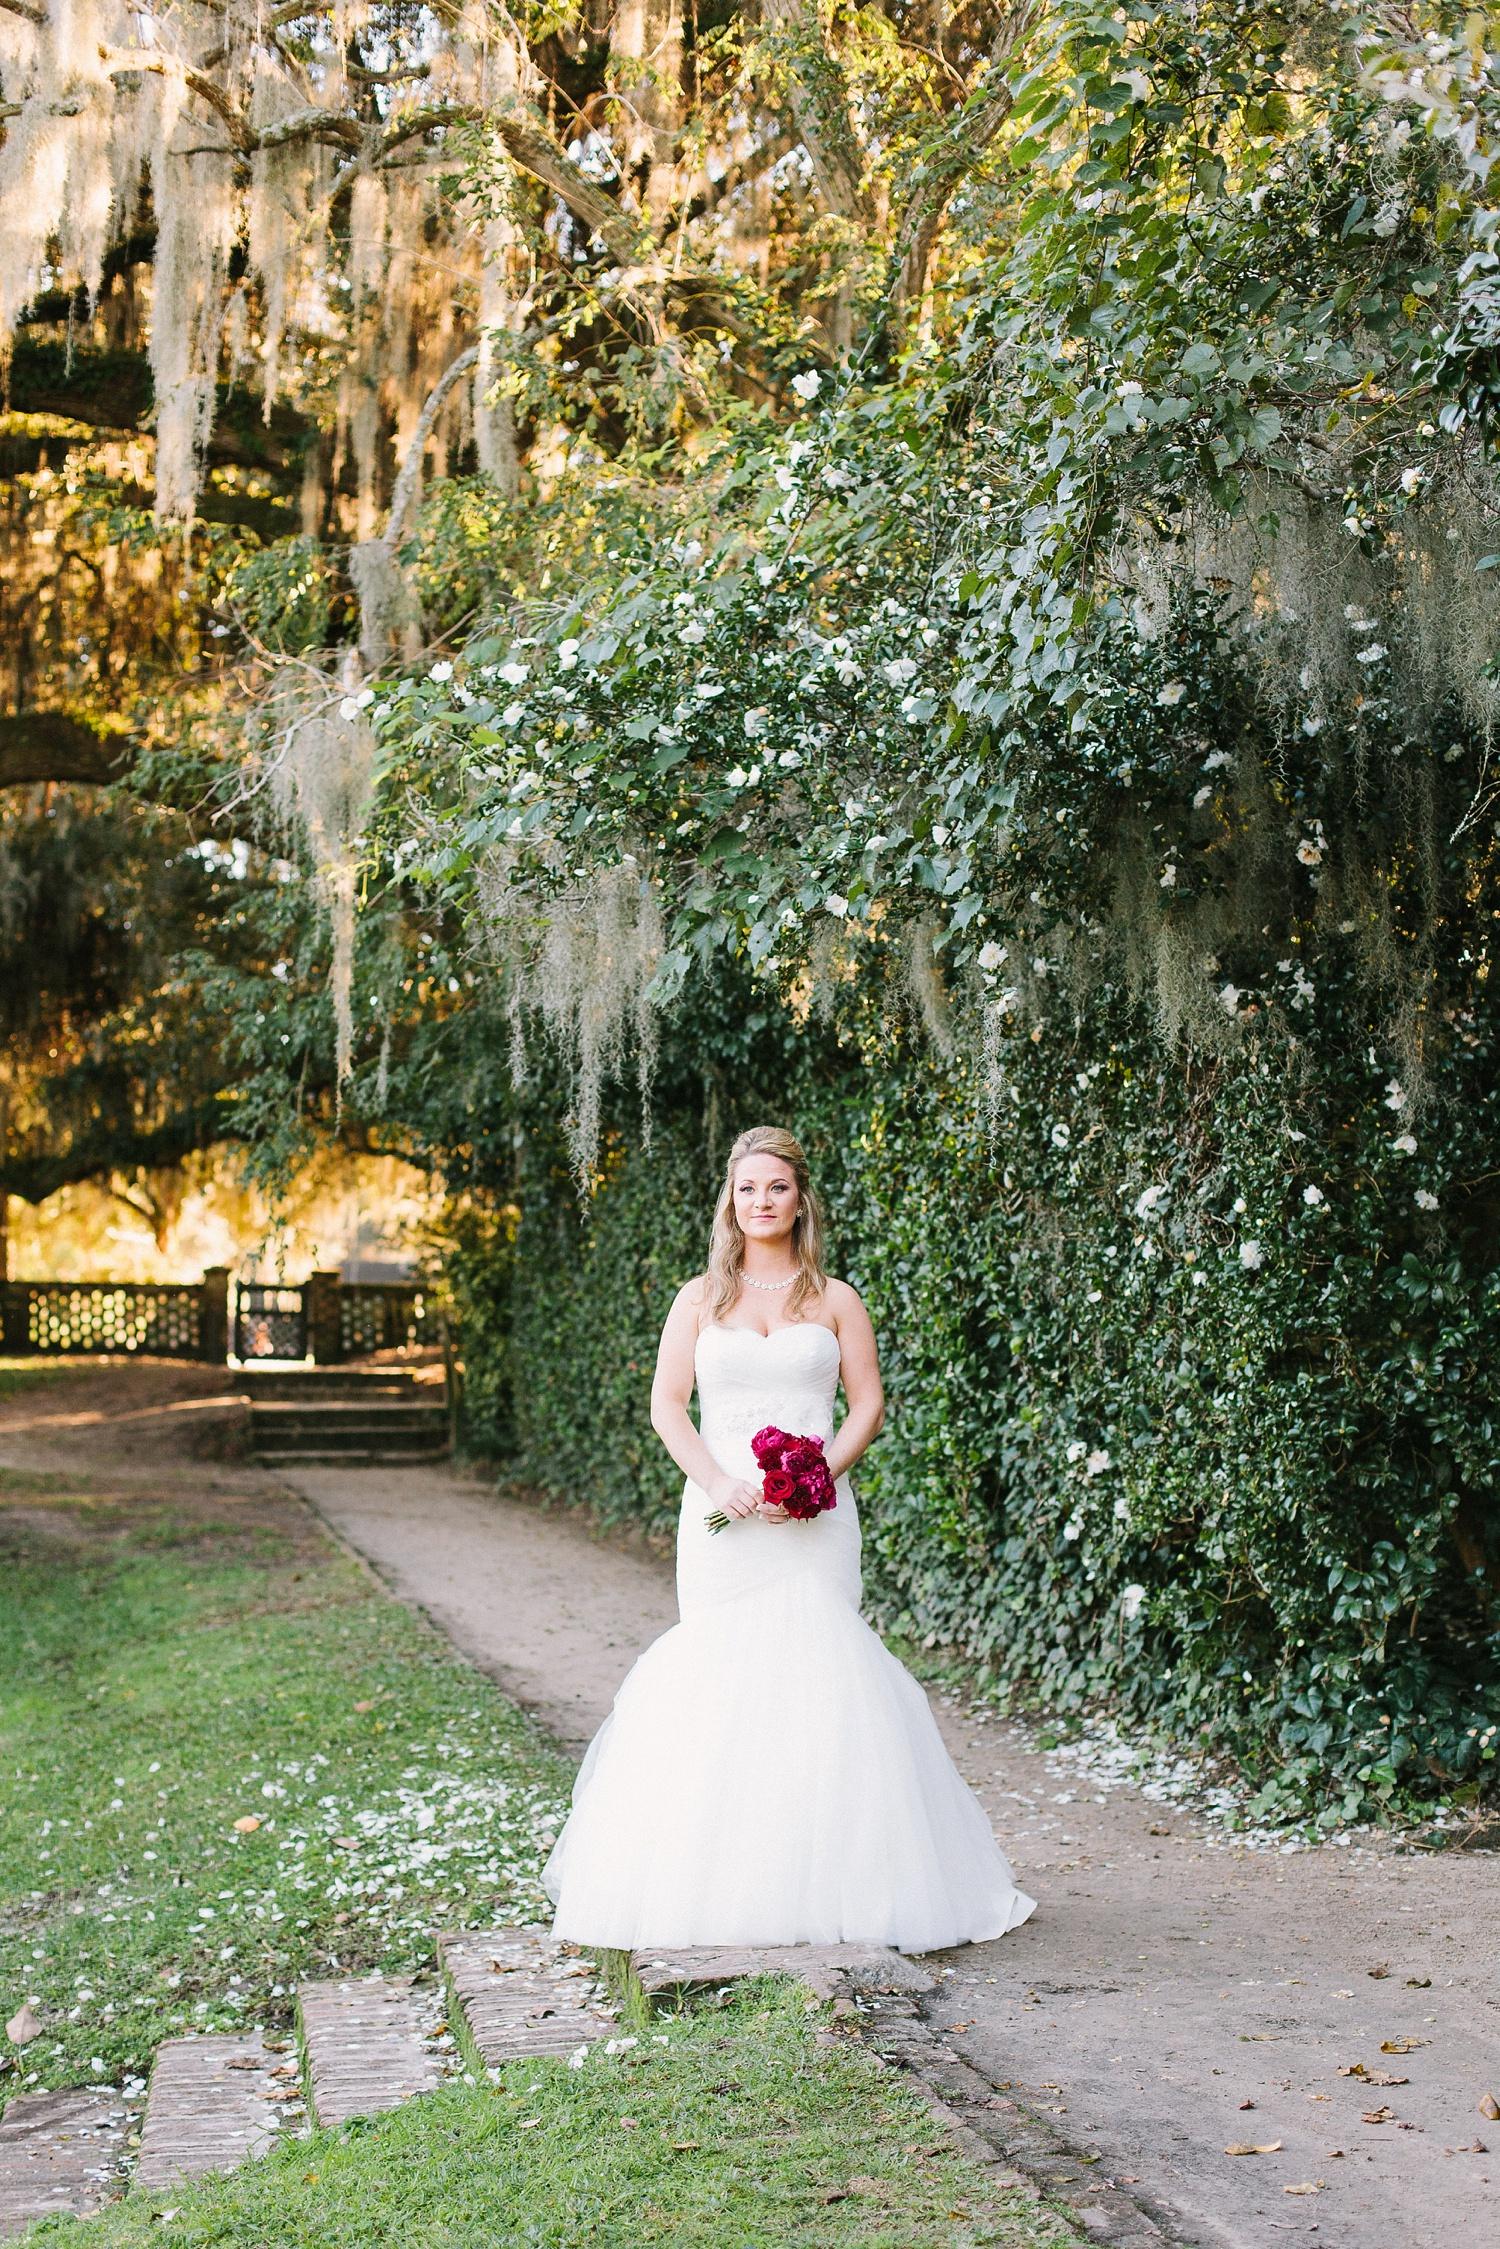 Lindsey_A_Miller_photography_bridal_portrait_middleton_plantation_charleston_sunset_spanish_moss_007.jpg